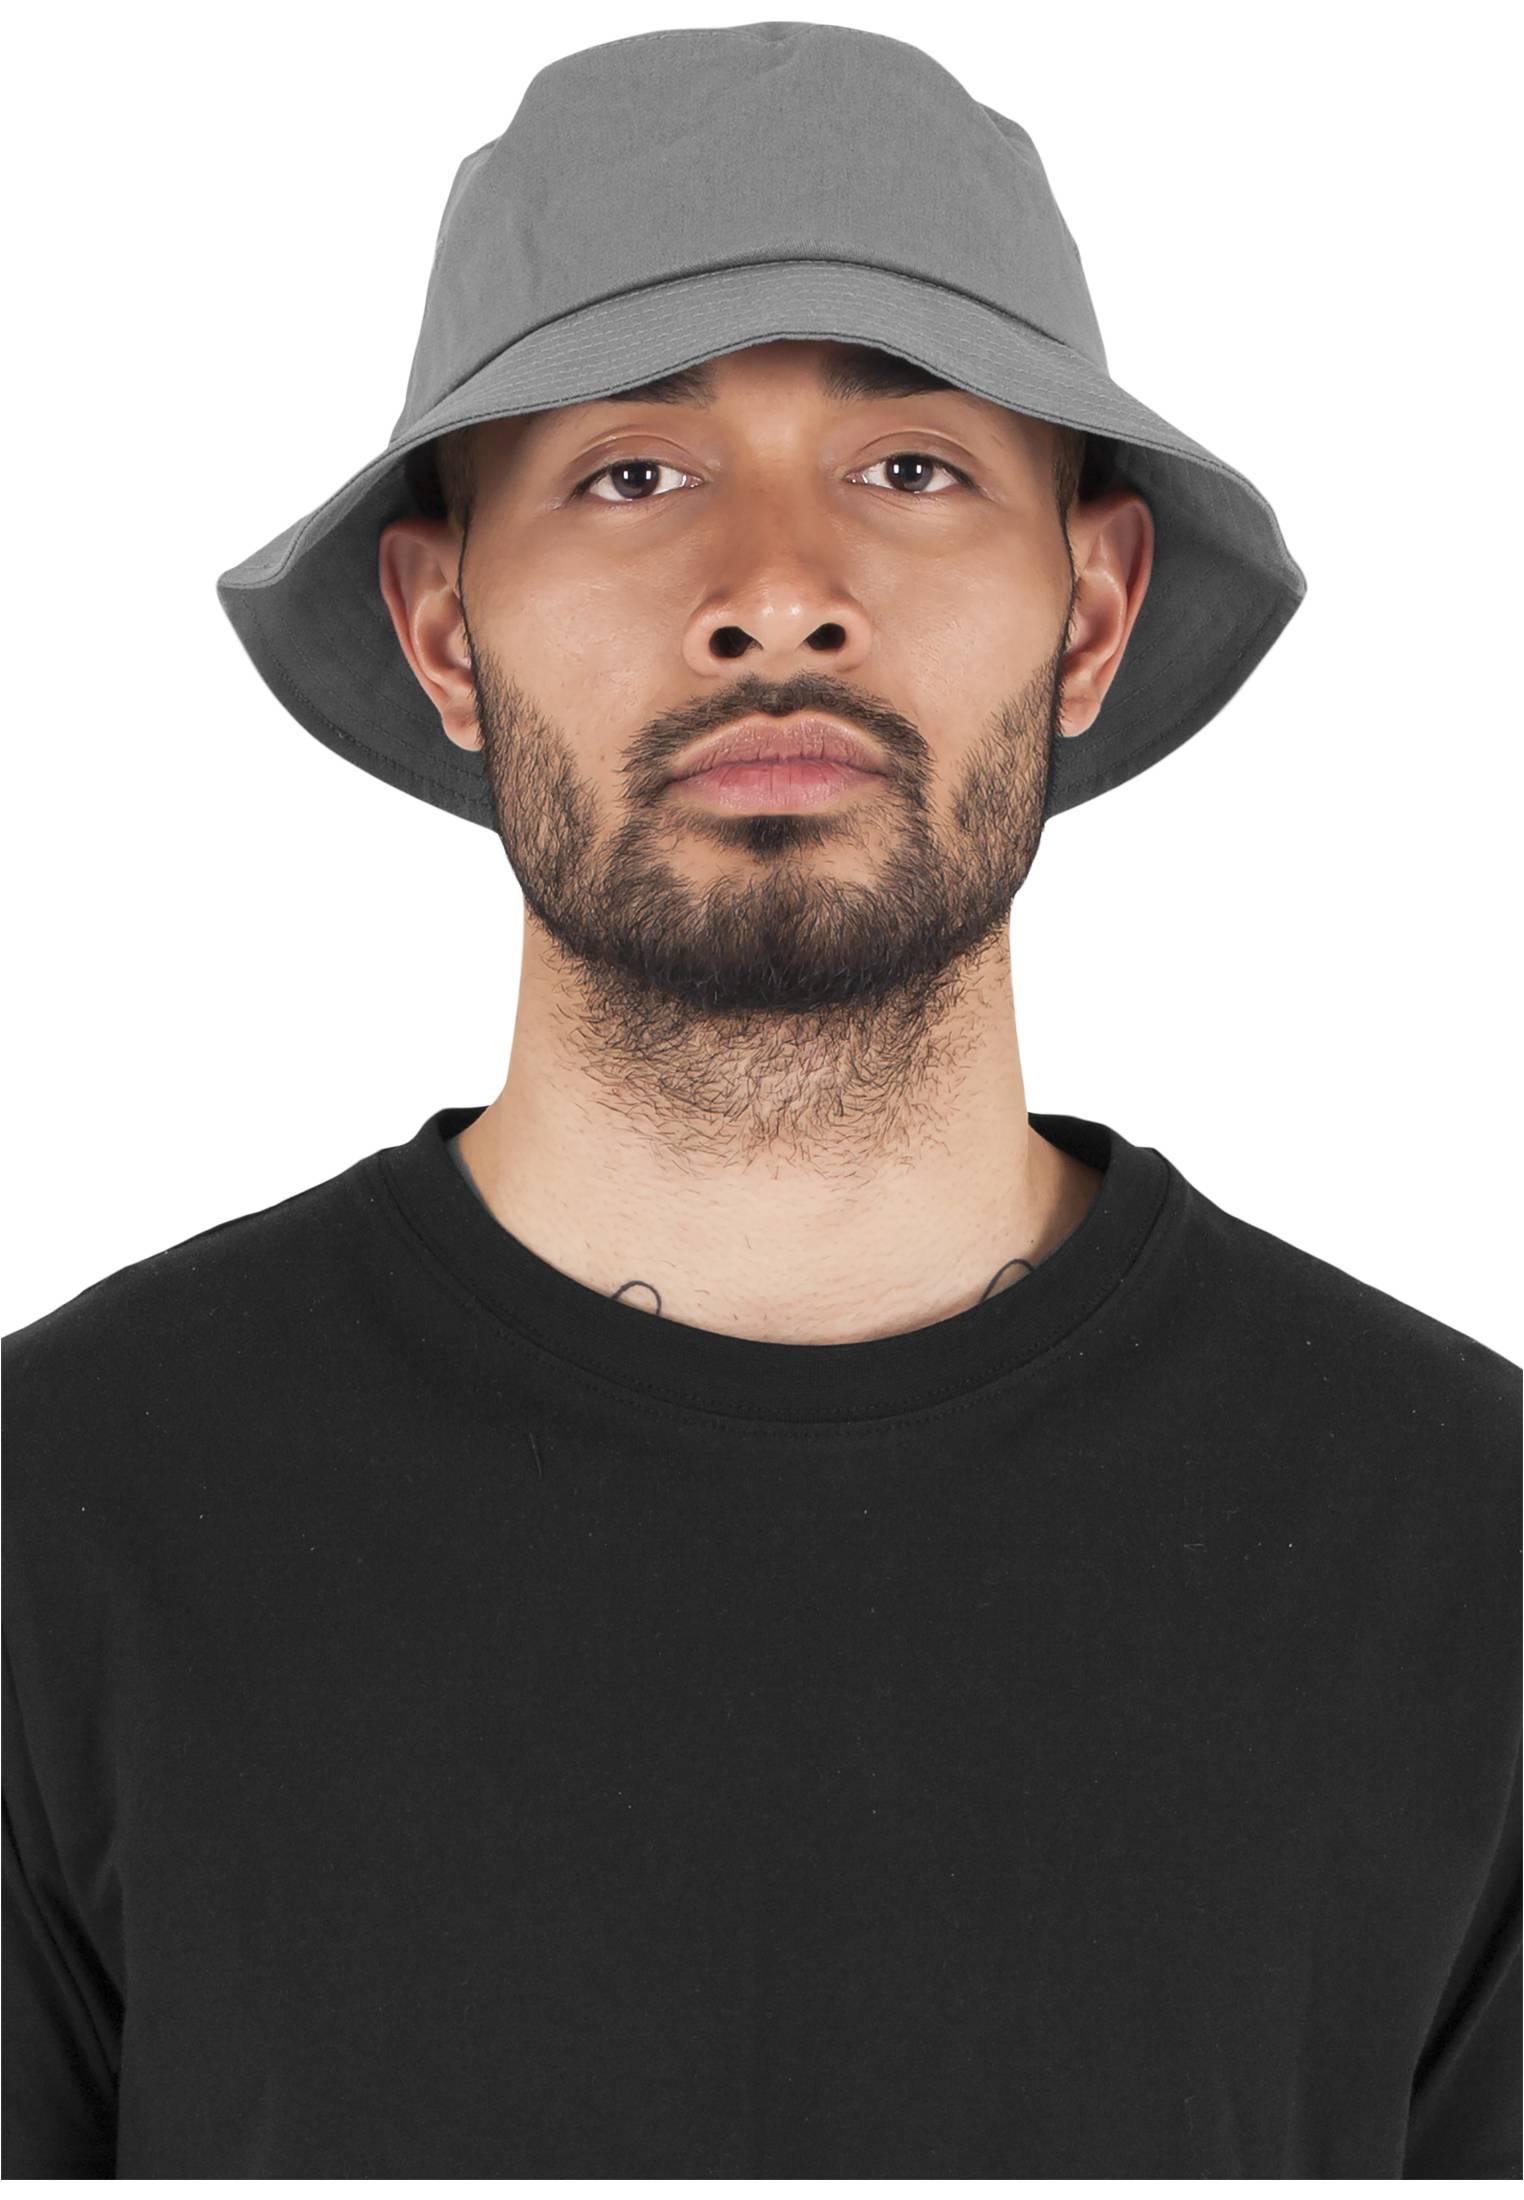 Urban Classics Flexfit Cotton Twill Bucket Hat grey - One Size